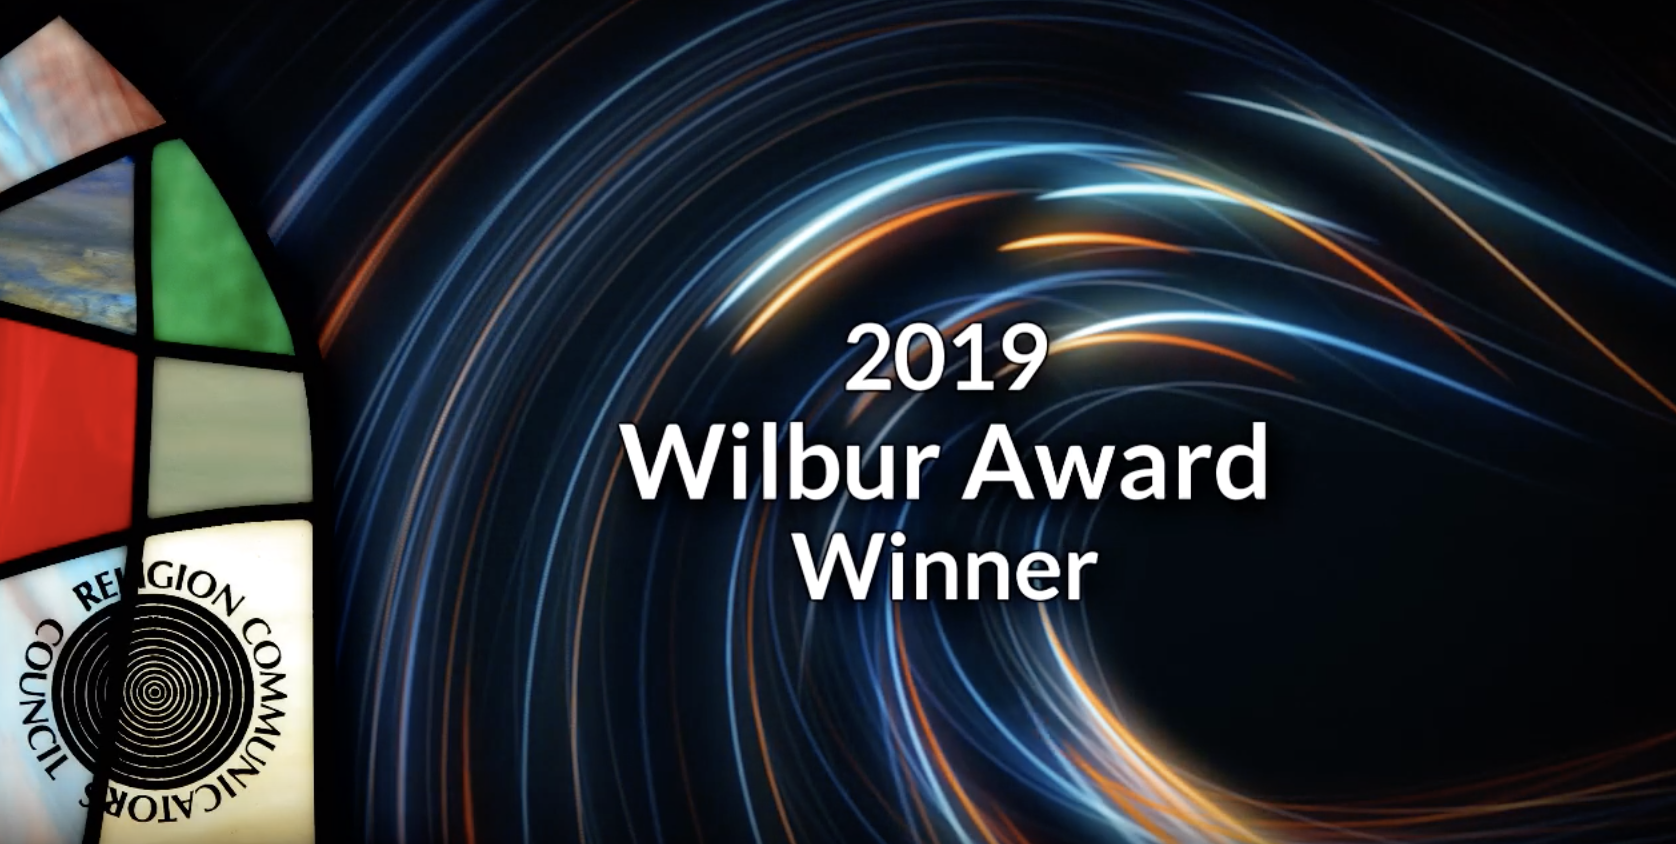 Wilbur Award Winner - Nonfiction Books 2019